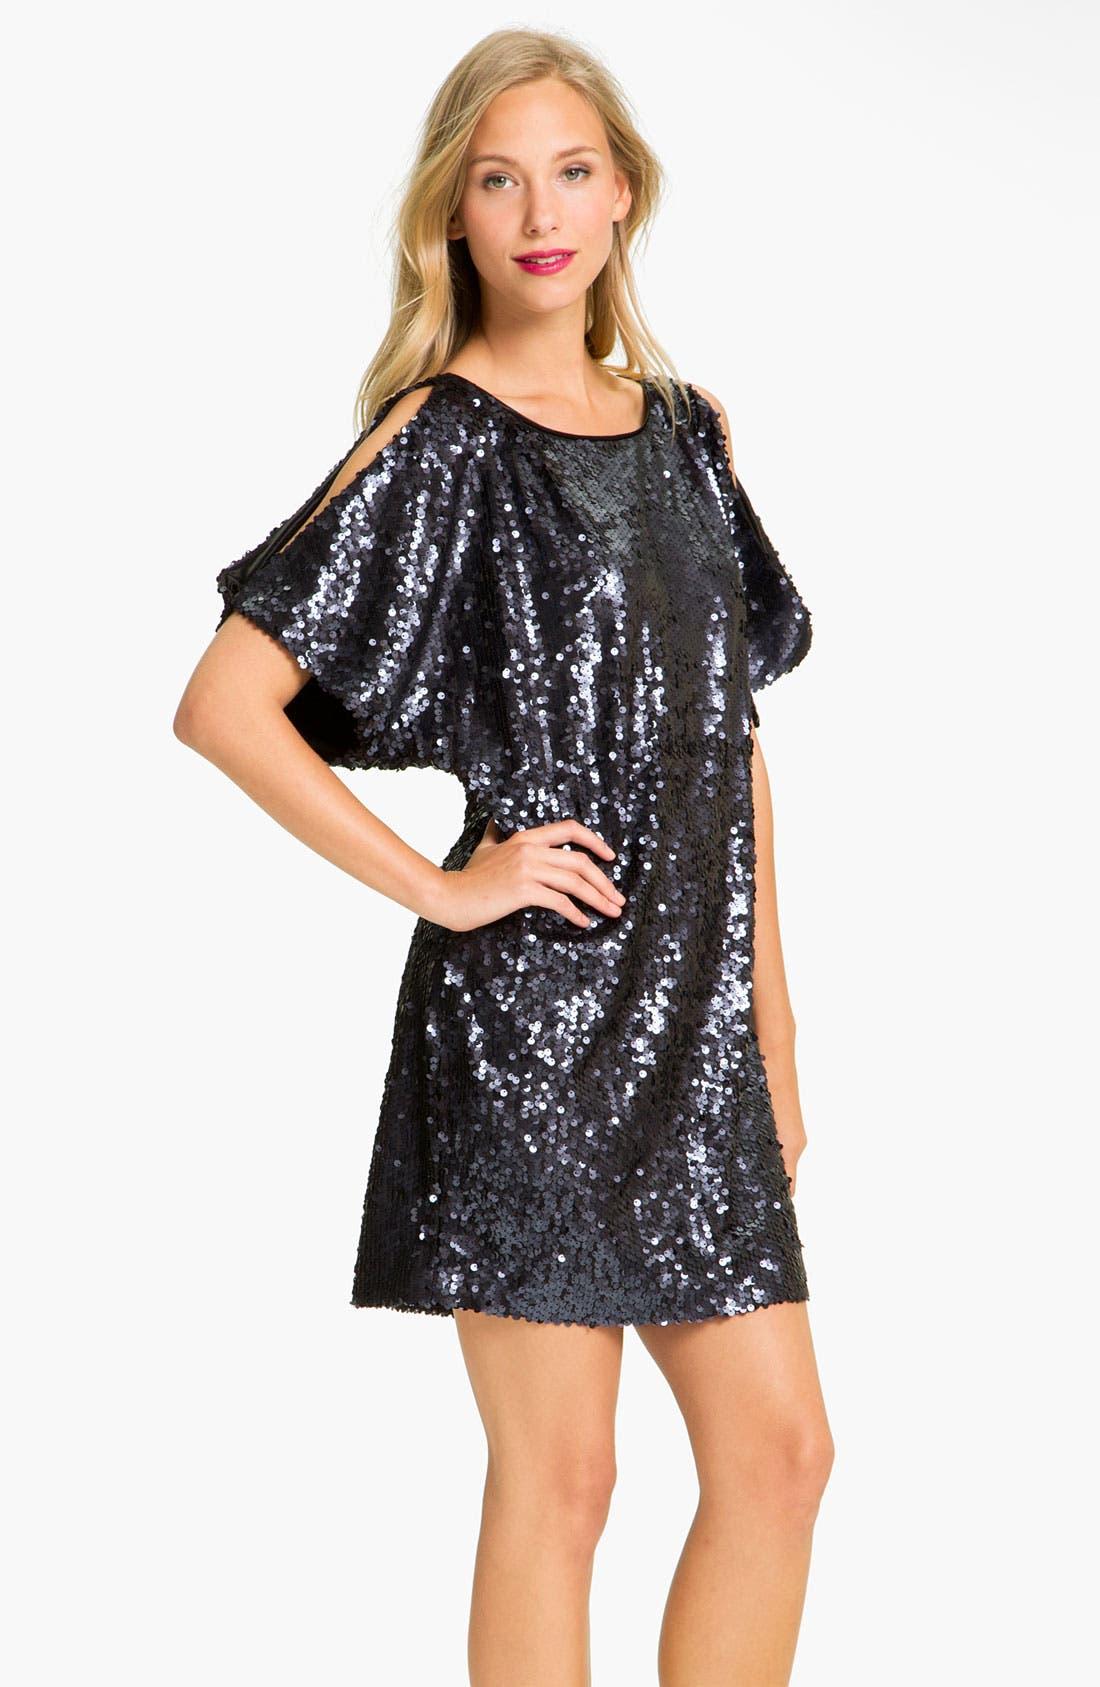 Alternate Image 1 Selected - Aidan Mattox Sequin Cold Shoulder Shift Dress